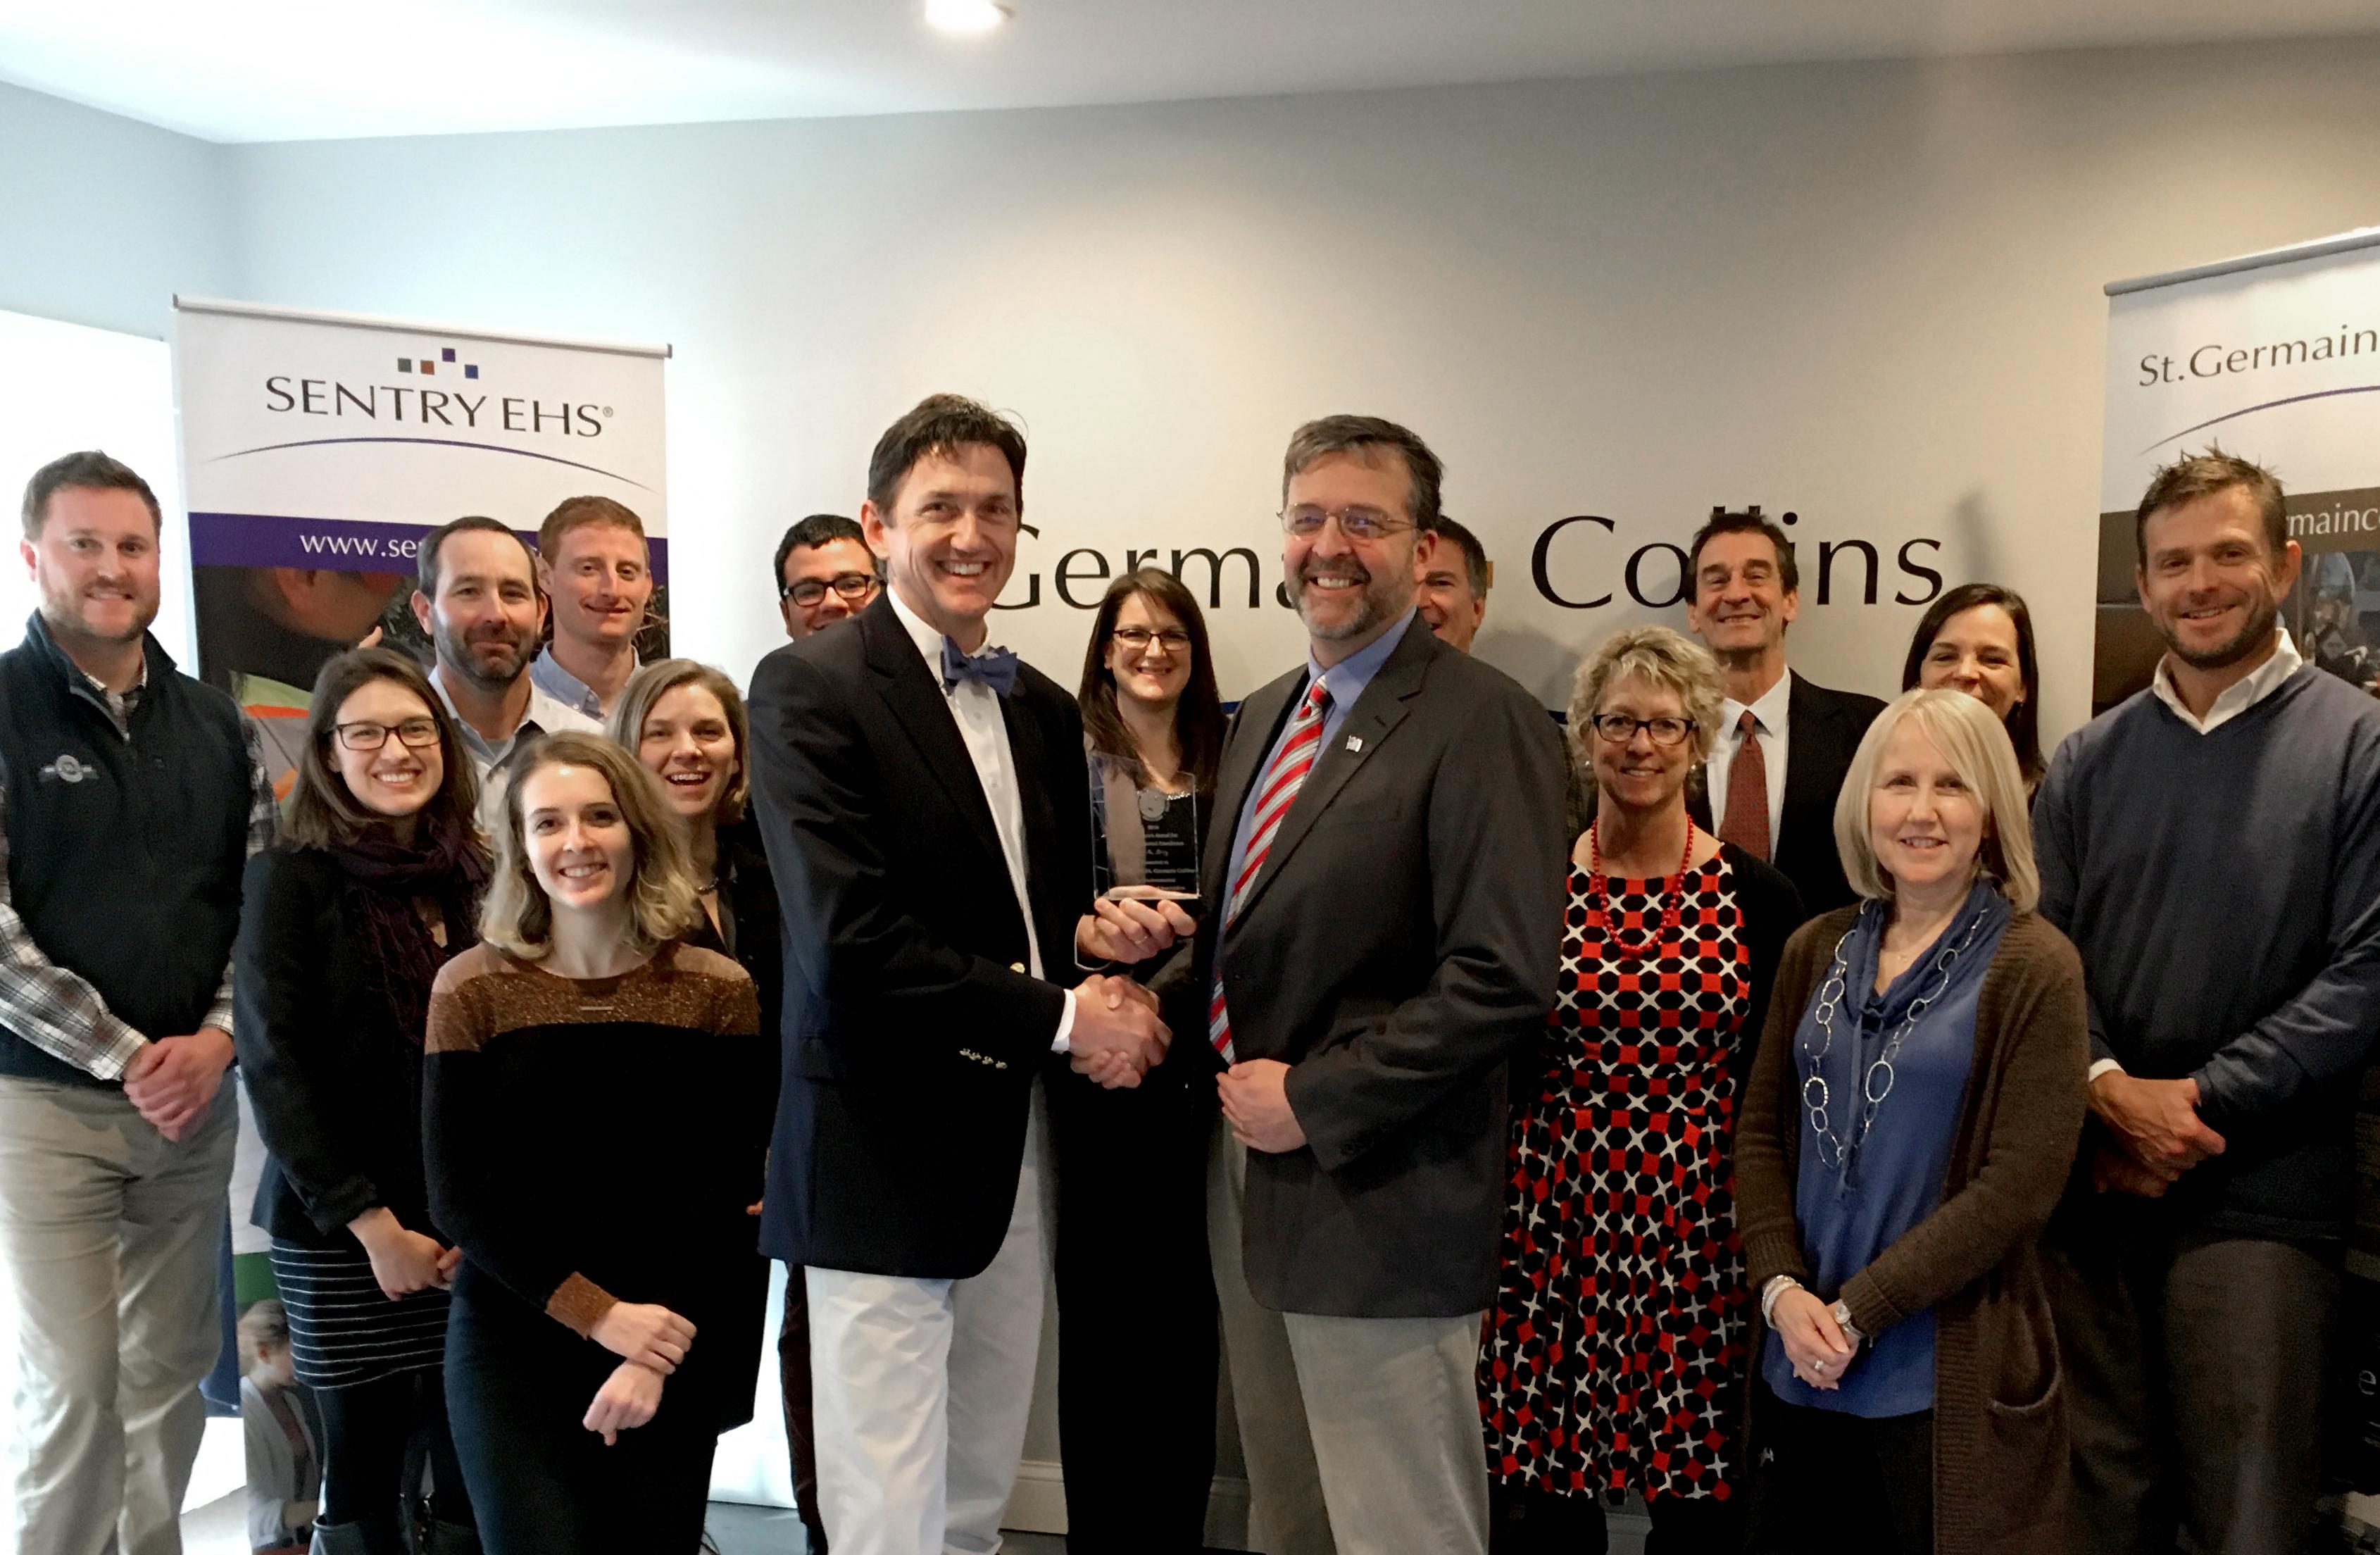 Governor's Award Photo